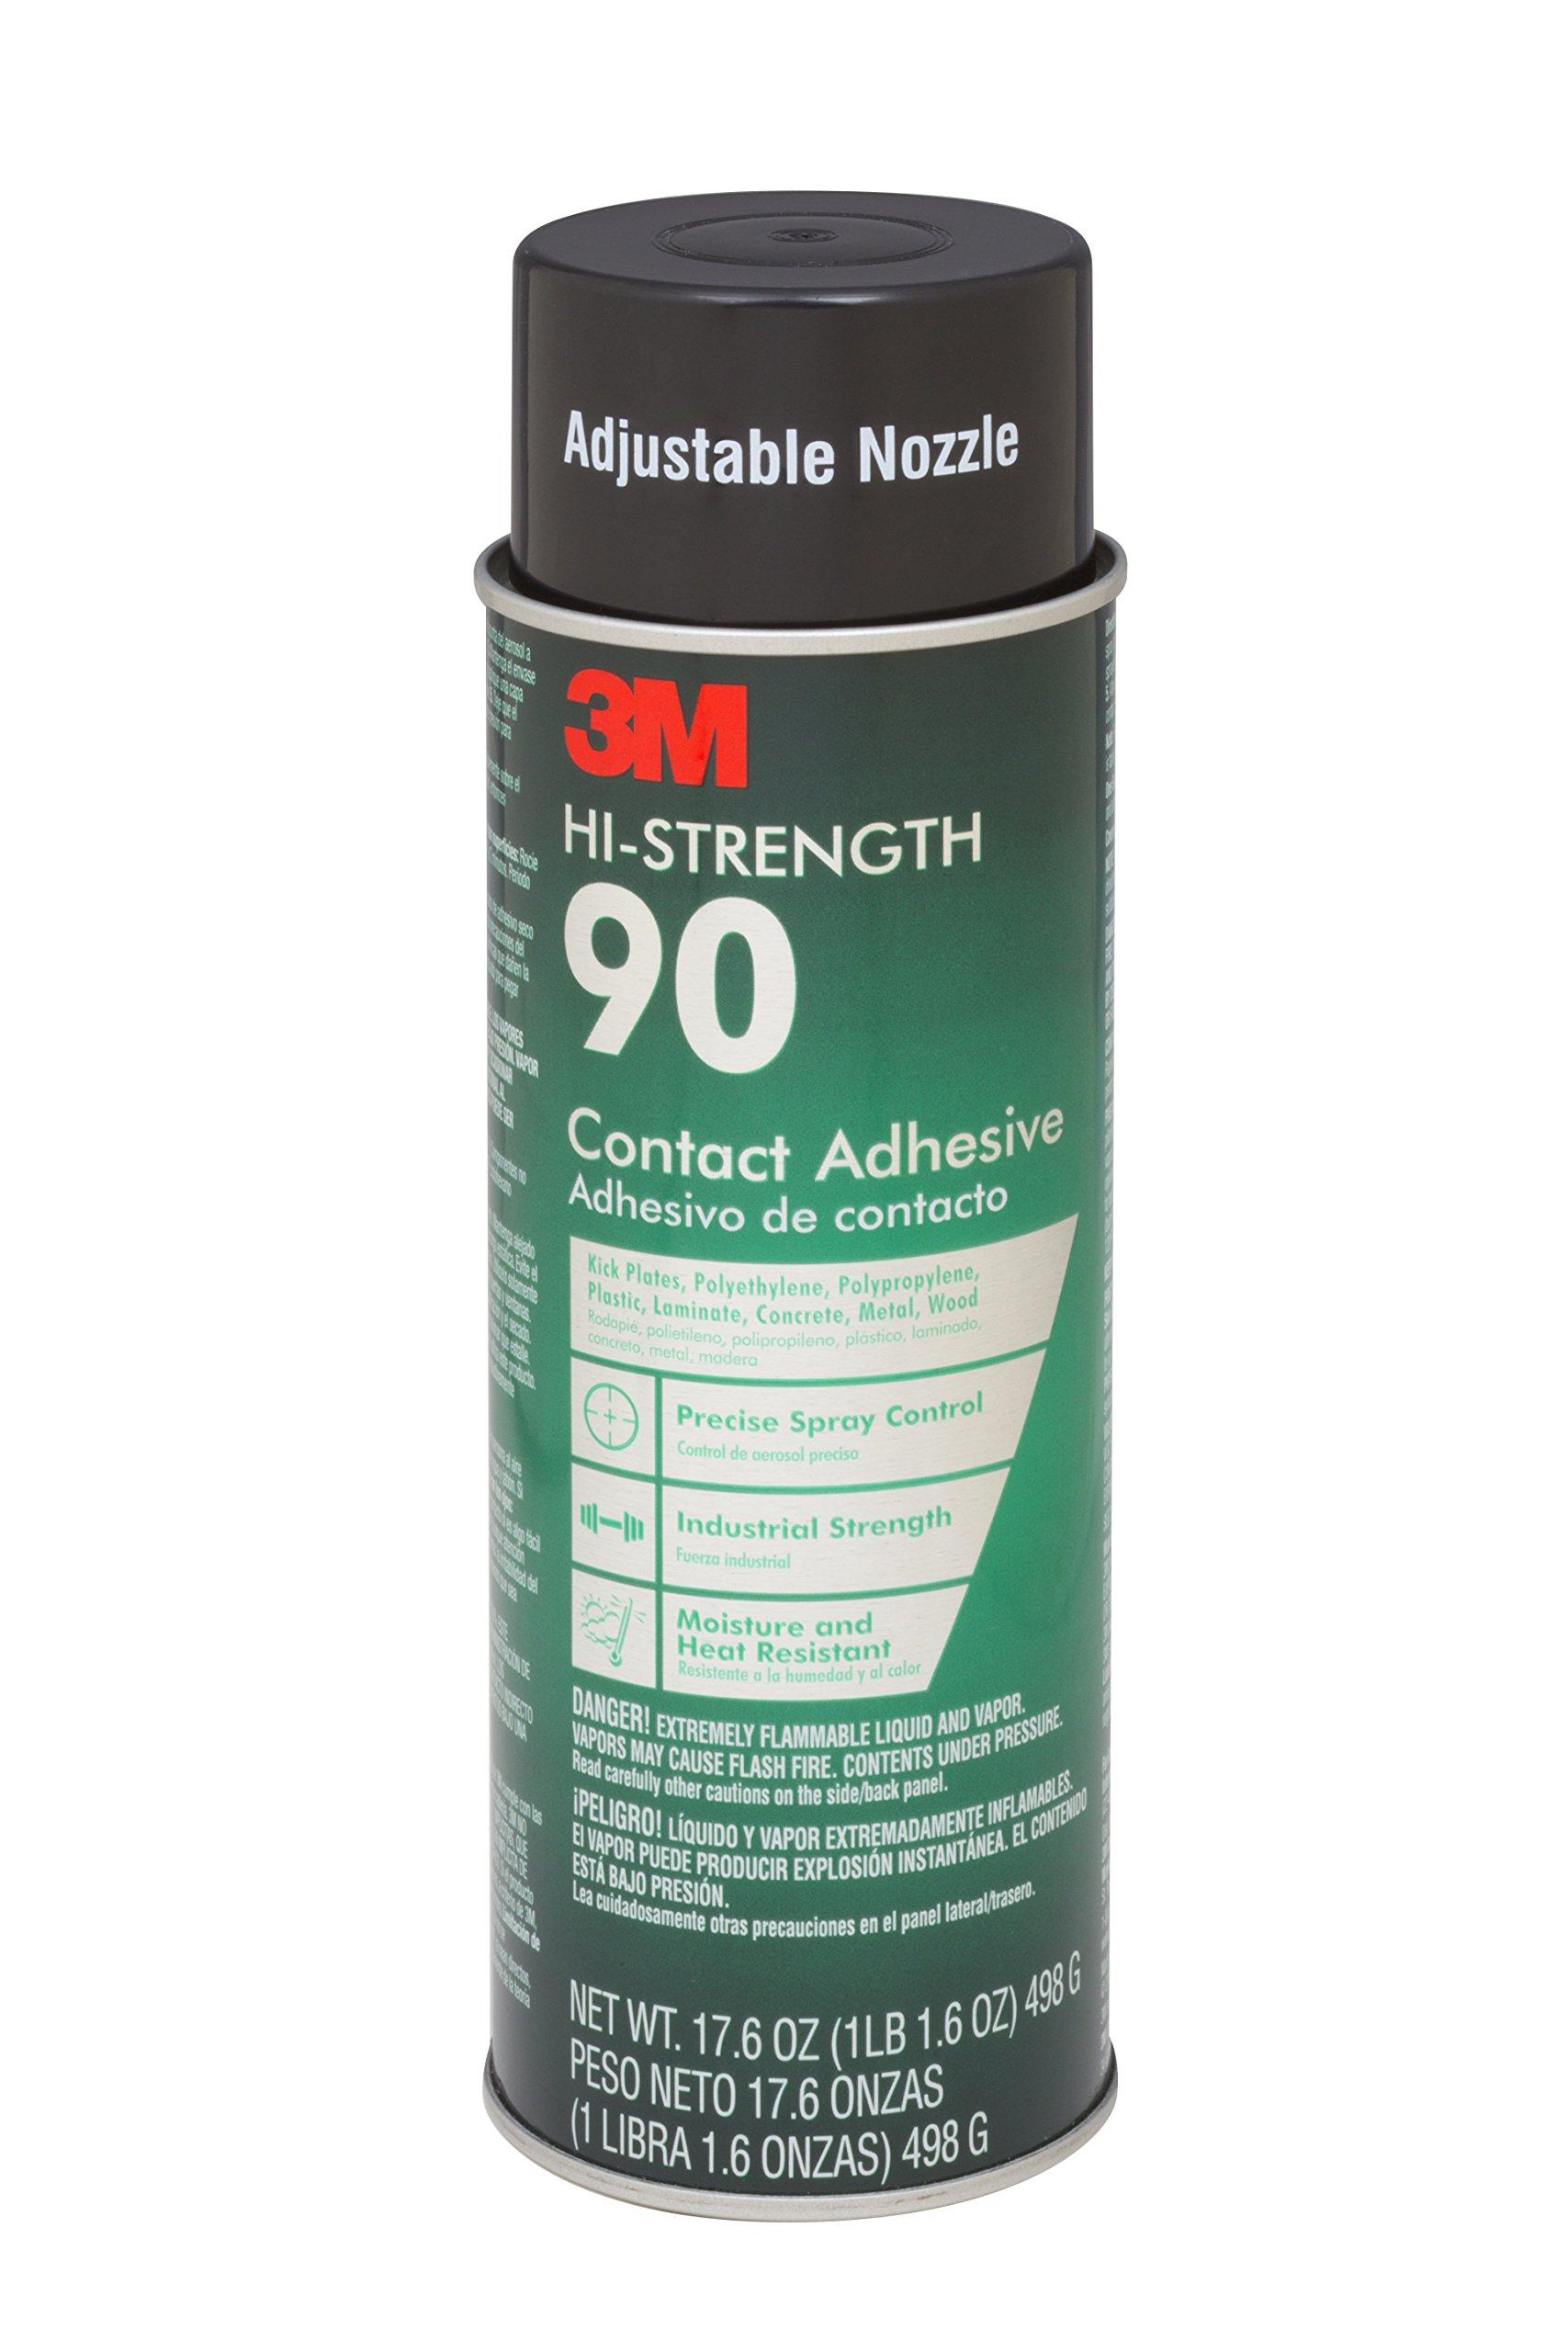 3M 90-24 Spray Adhesive, 17.60 Oz, 12 per Case